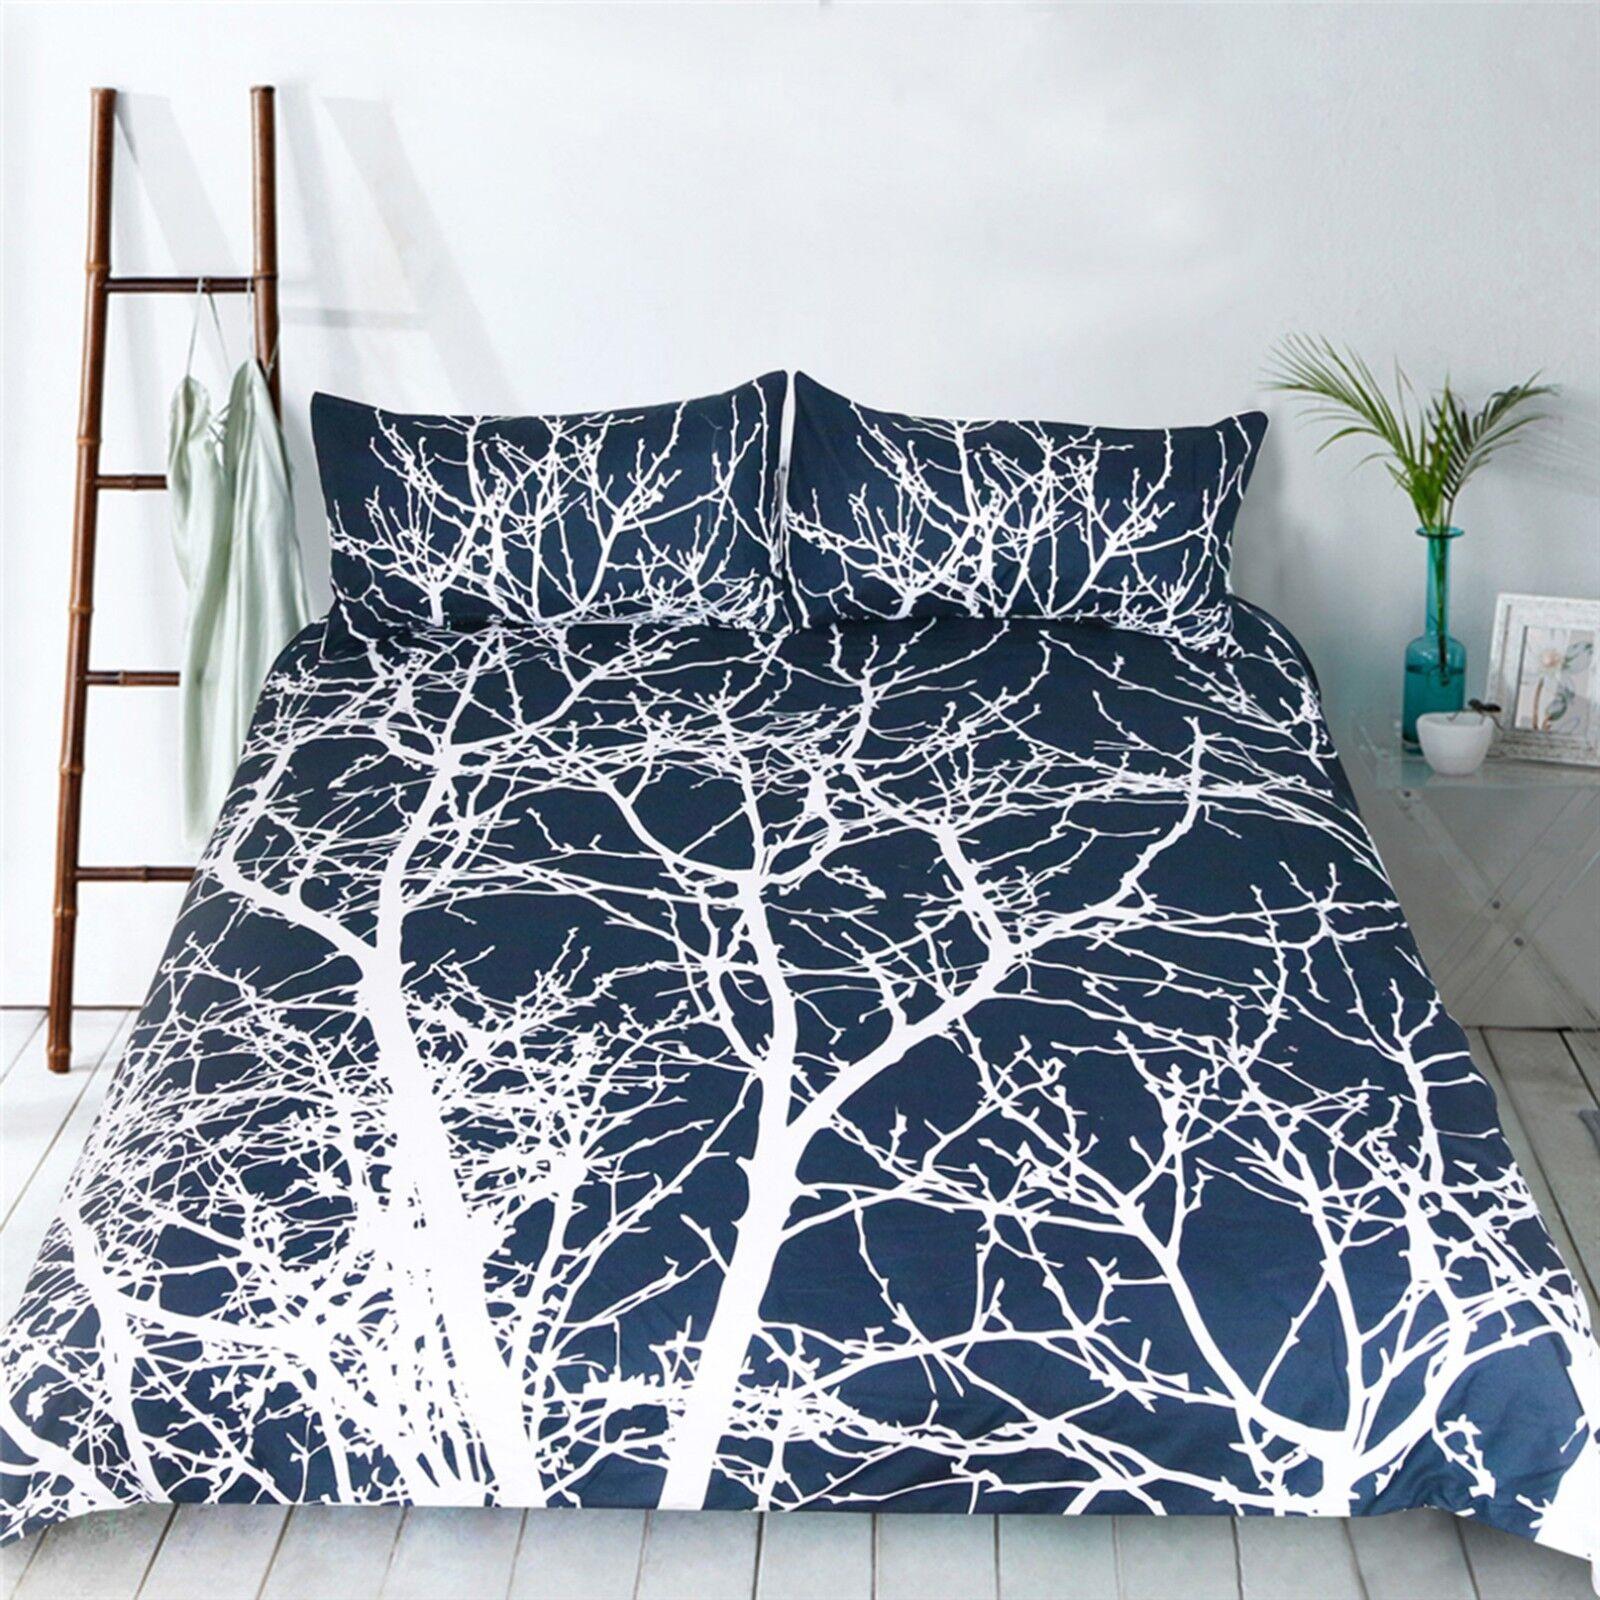 3D Weiß Branches 5 Bed Pillowcases Quilt Duvet Cover Set Single Queen CA